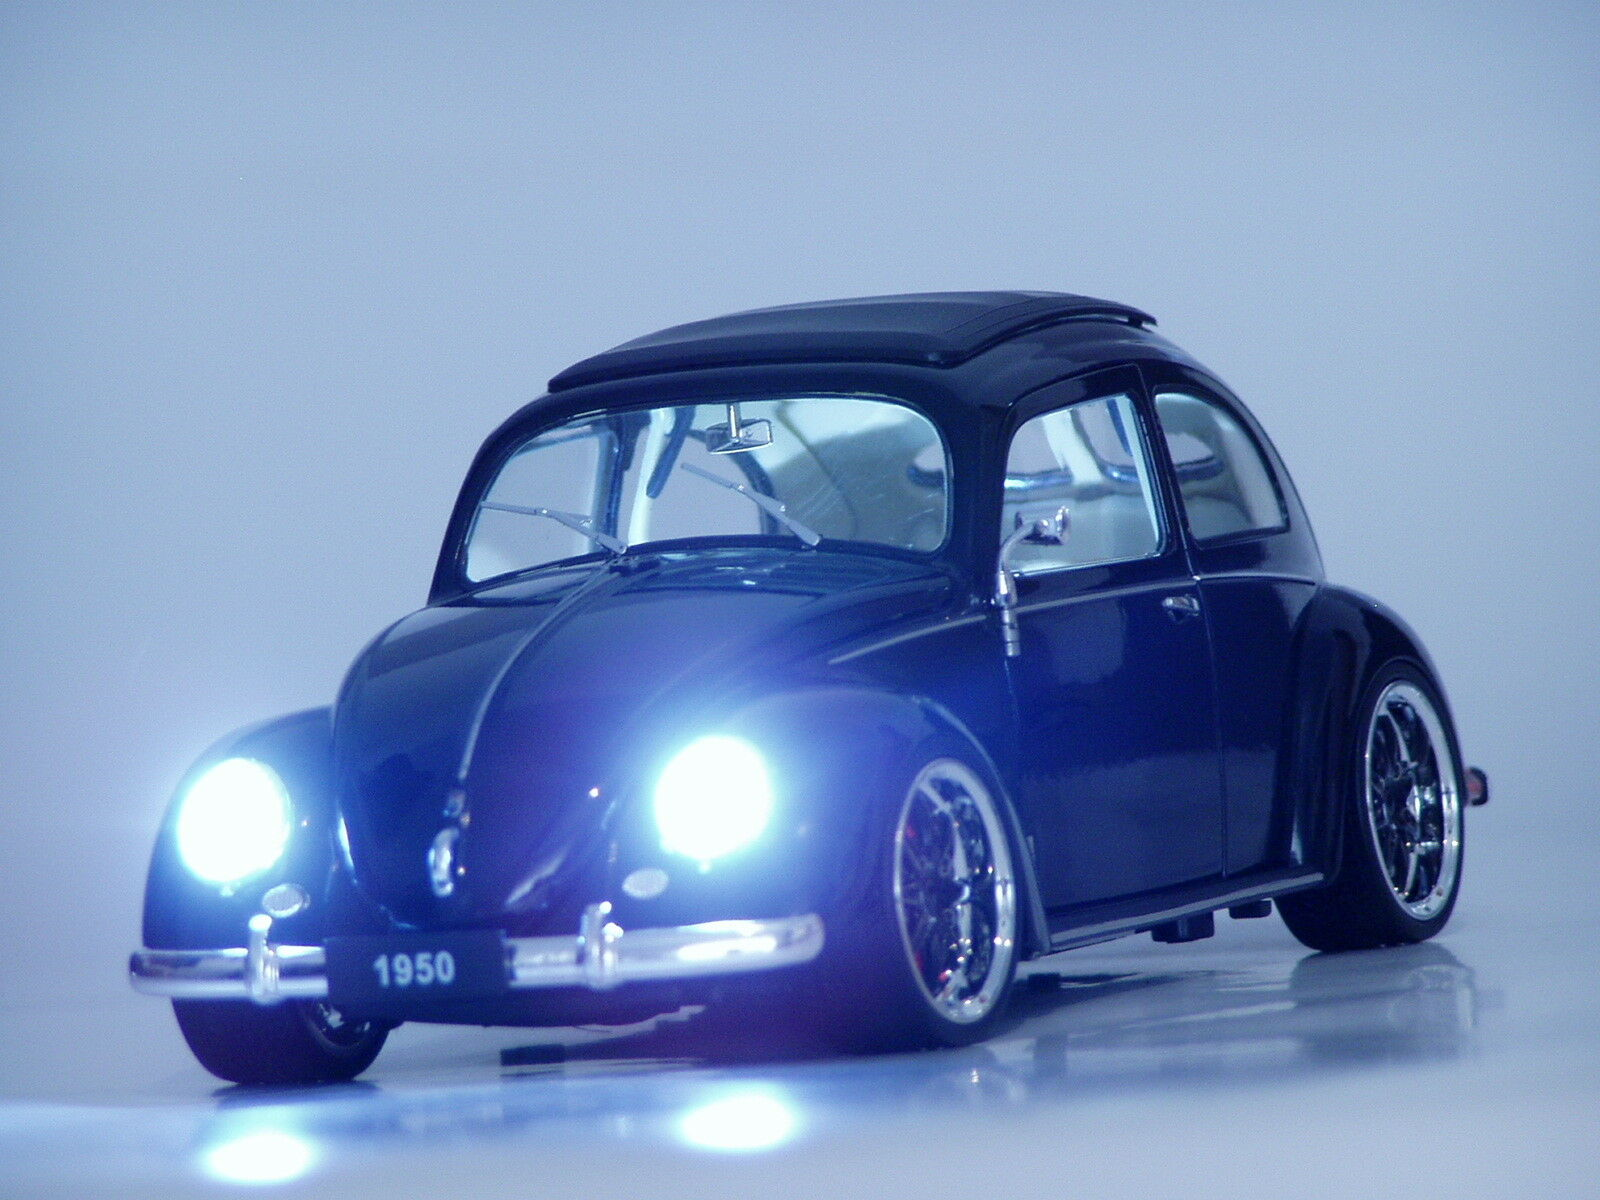 VW Käfer 1 18 Tuning Xenon Alufelgen Beleuchtung Beetle Brezelkäfer GTI R GT RS